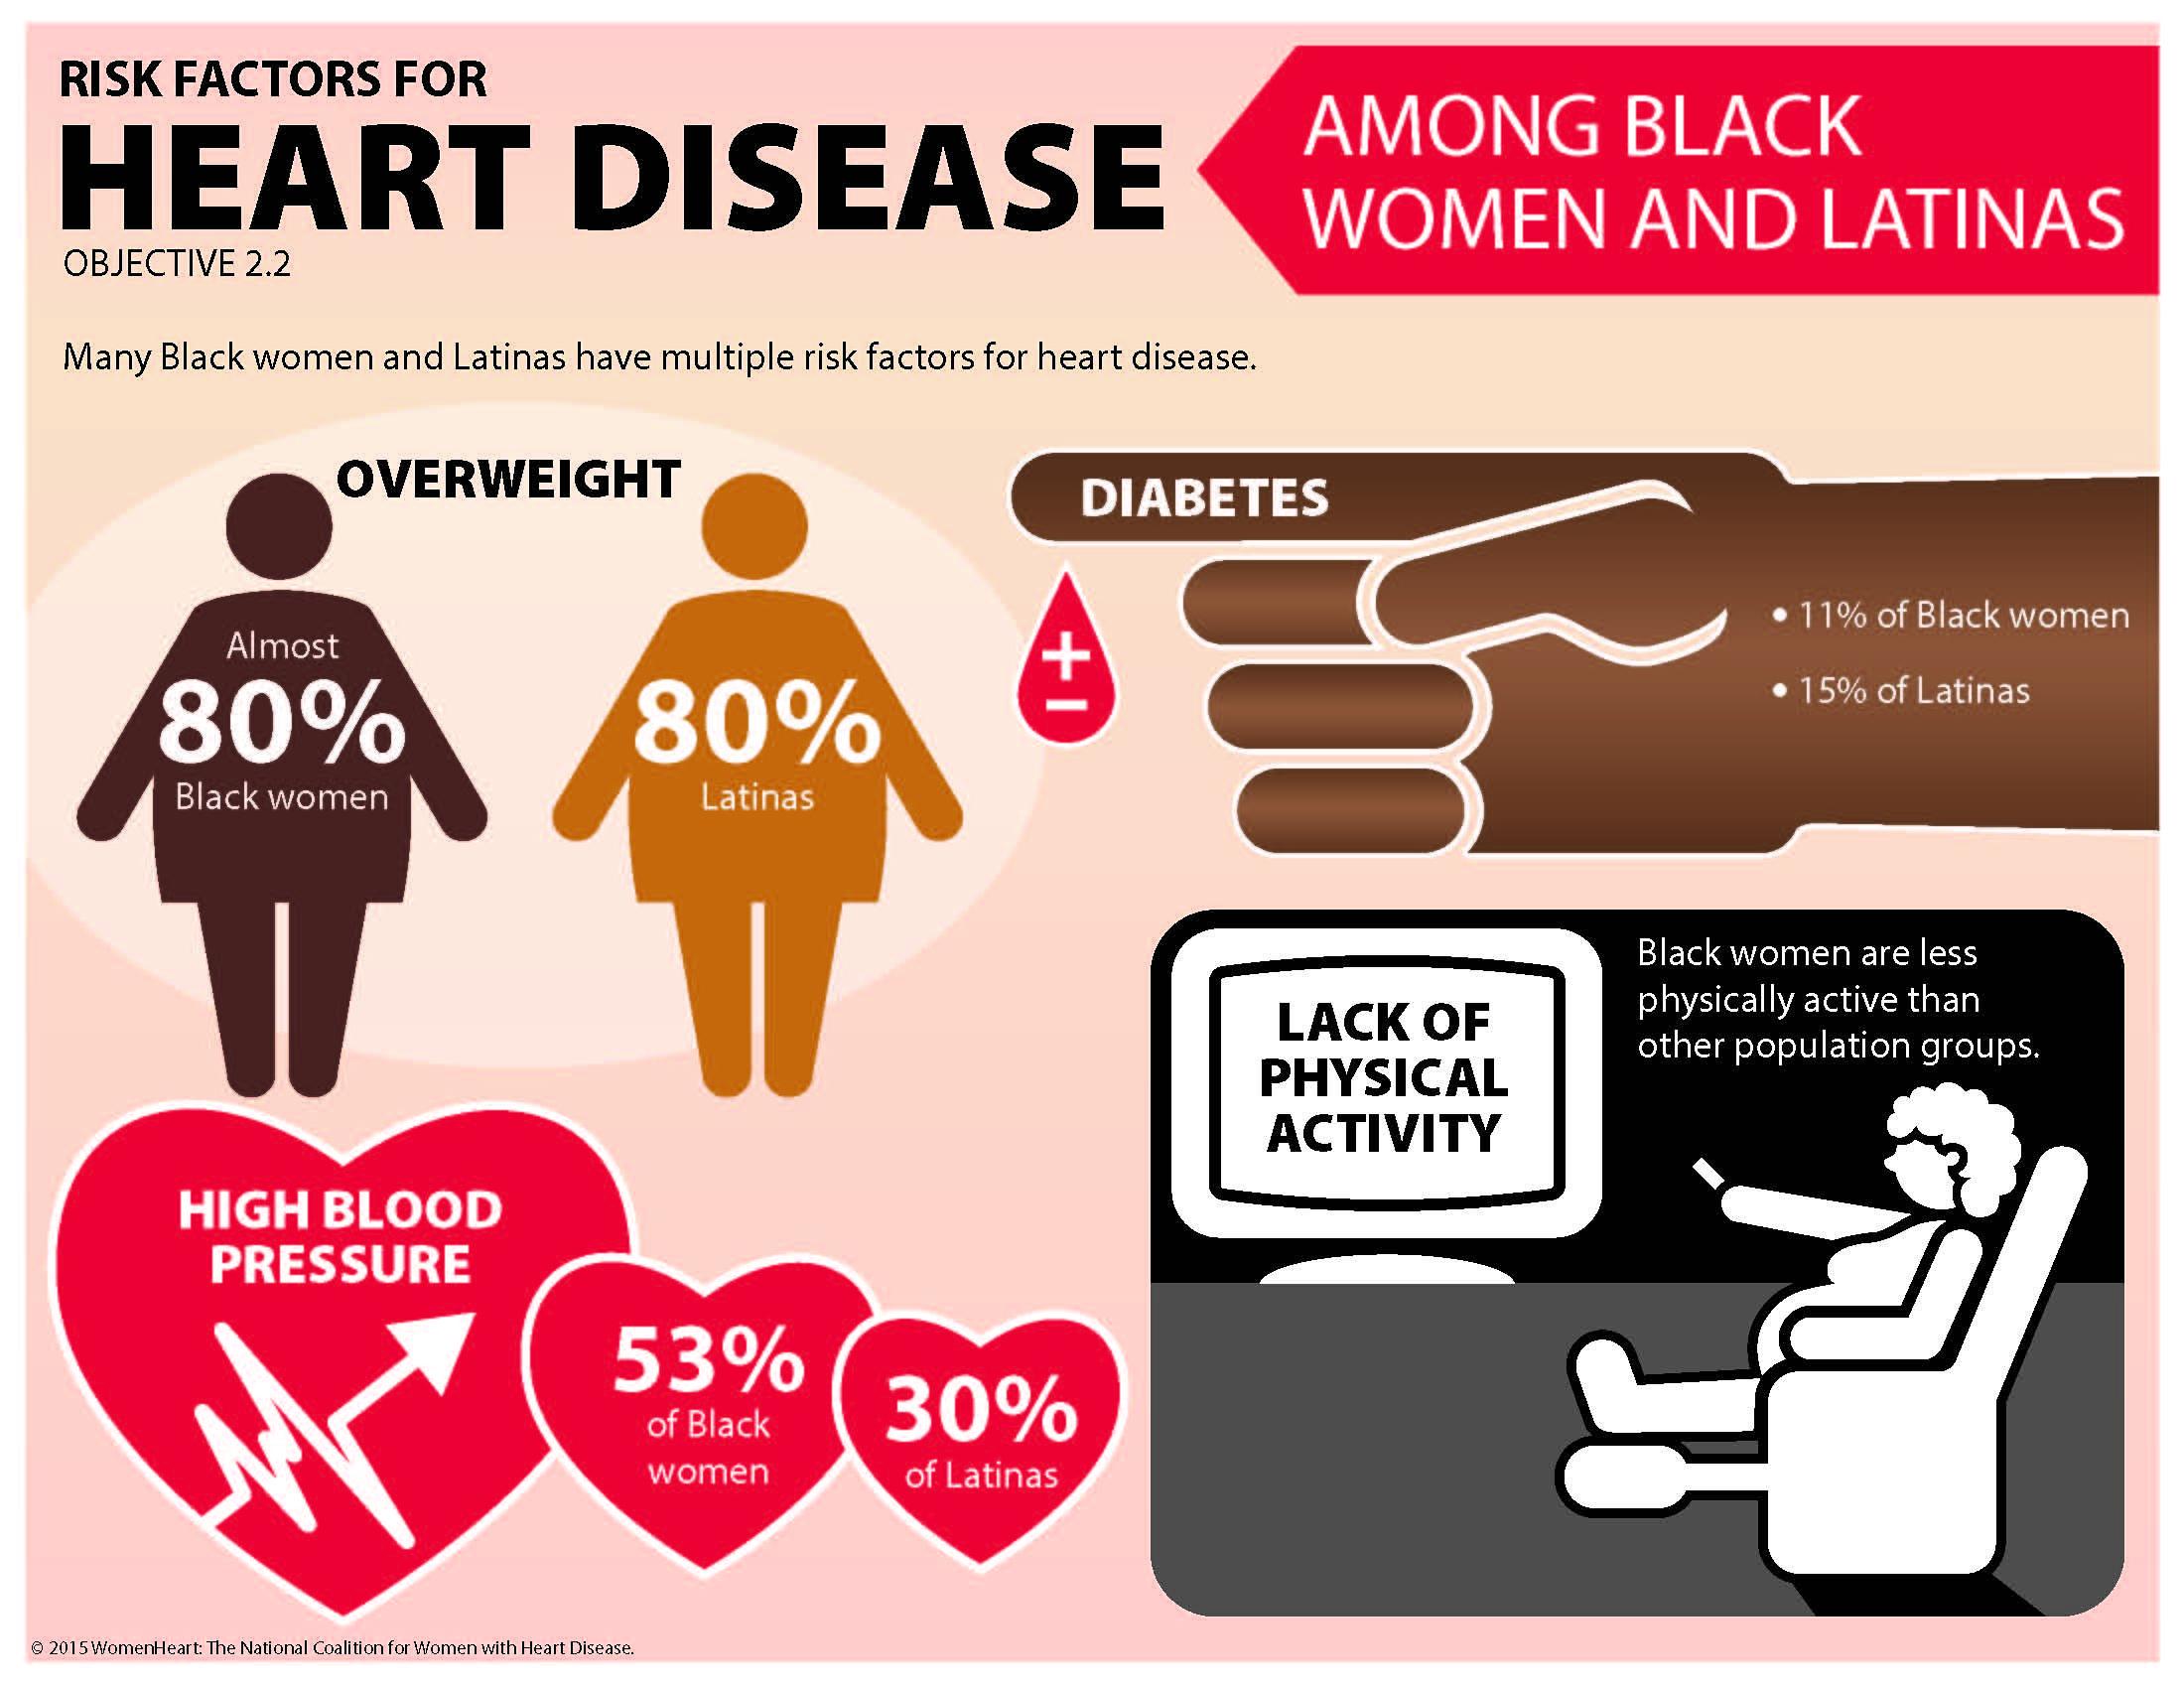 Heart disease risk factors in women of color. Heart